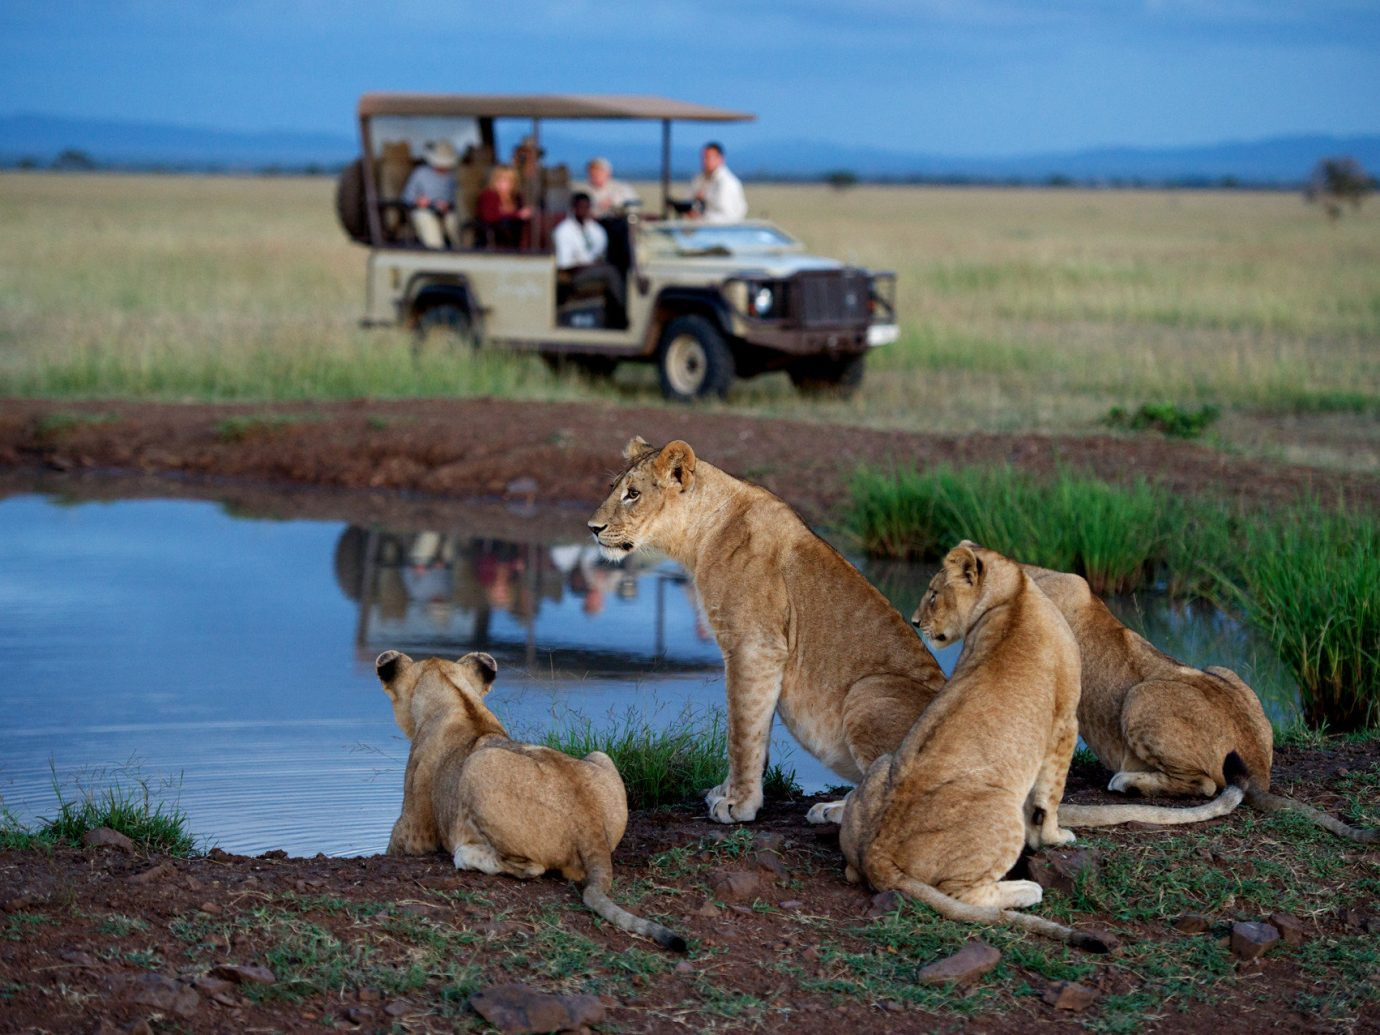 Singita Serengeti House, Tanzania - Lions in Africa